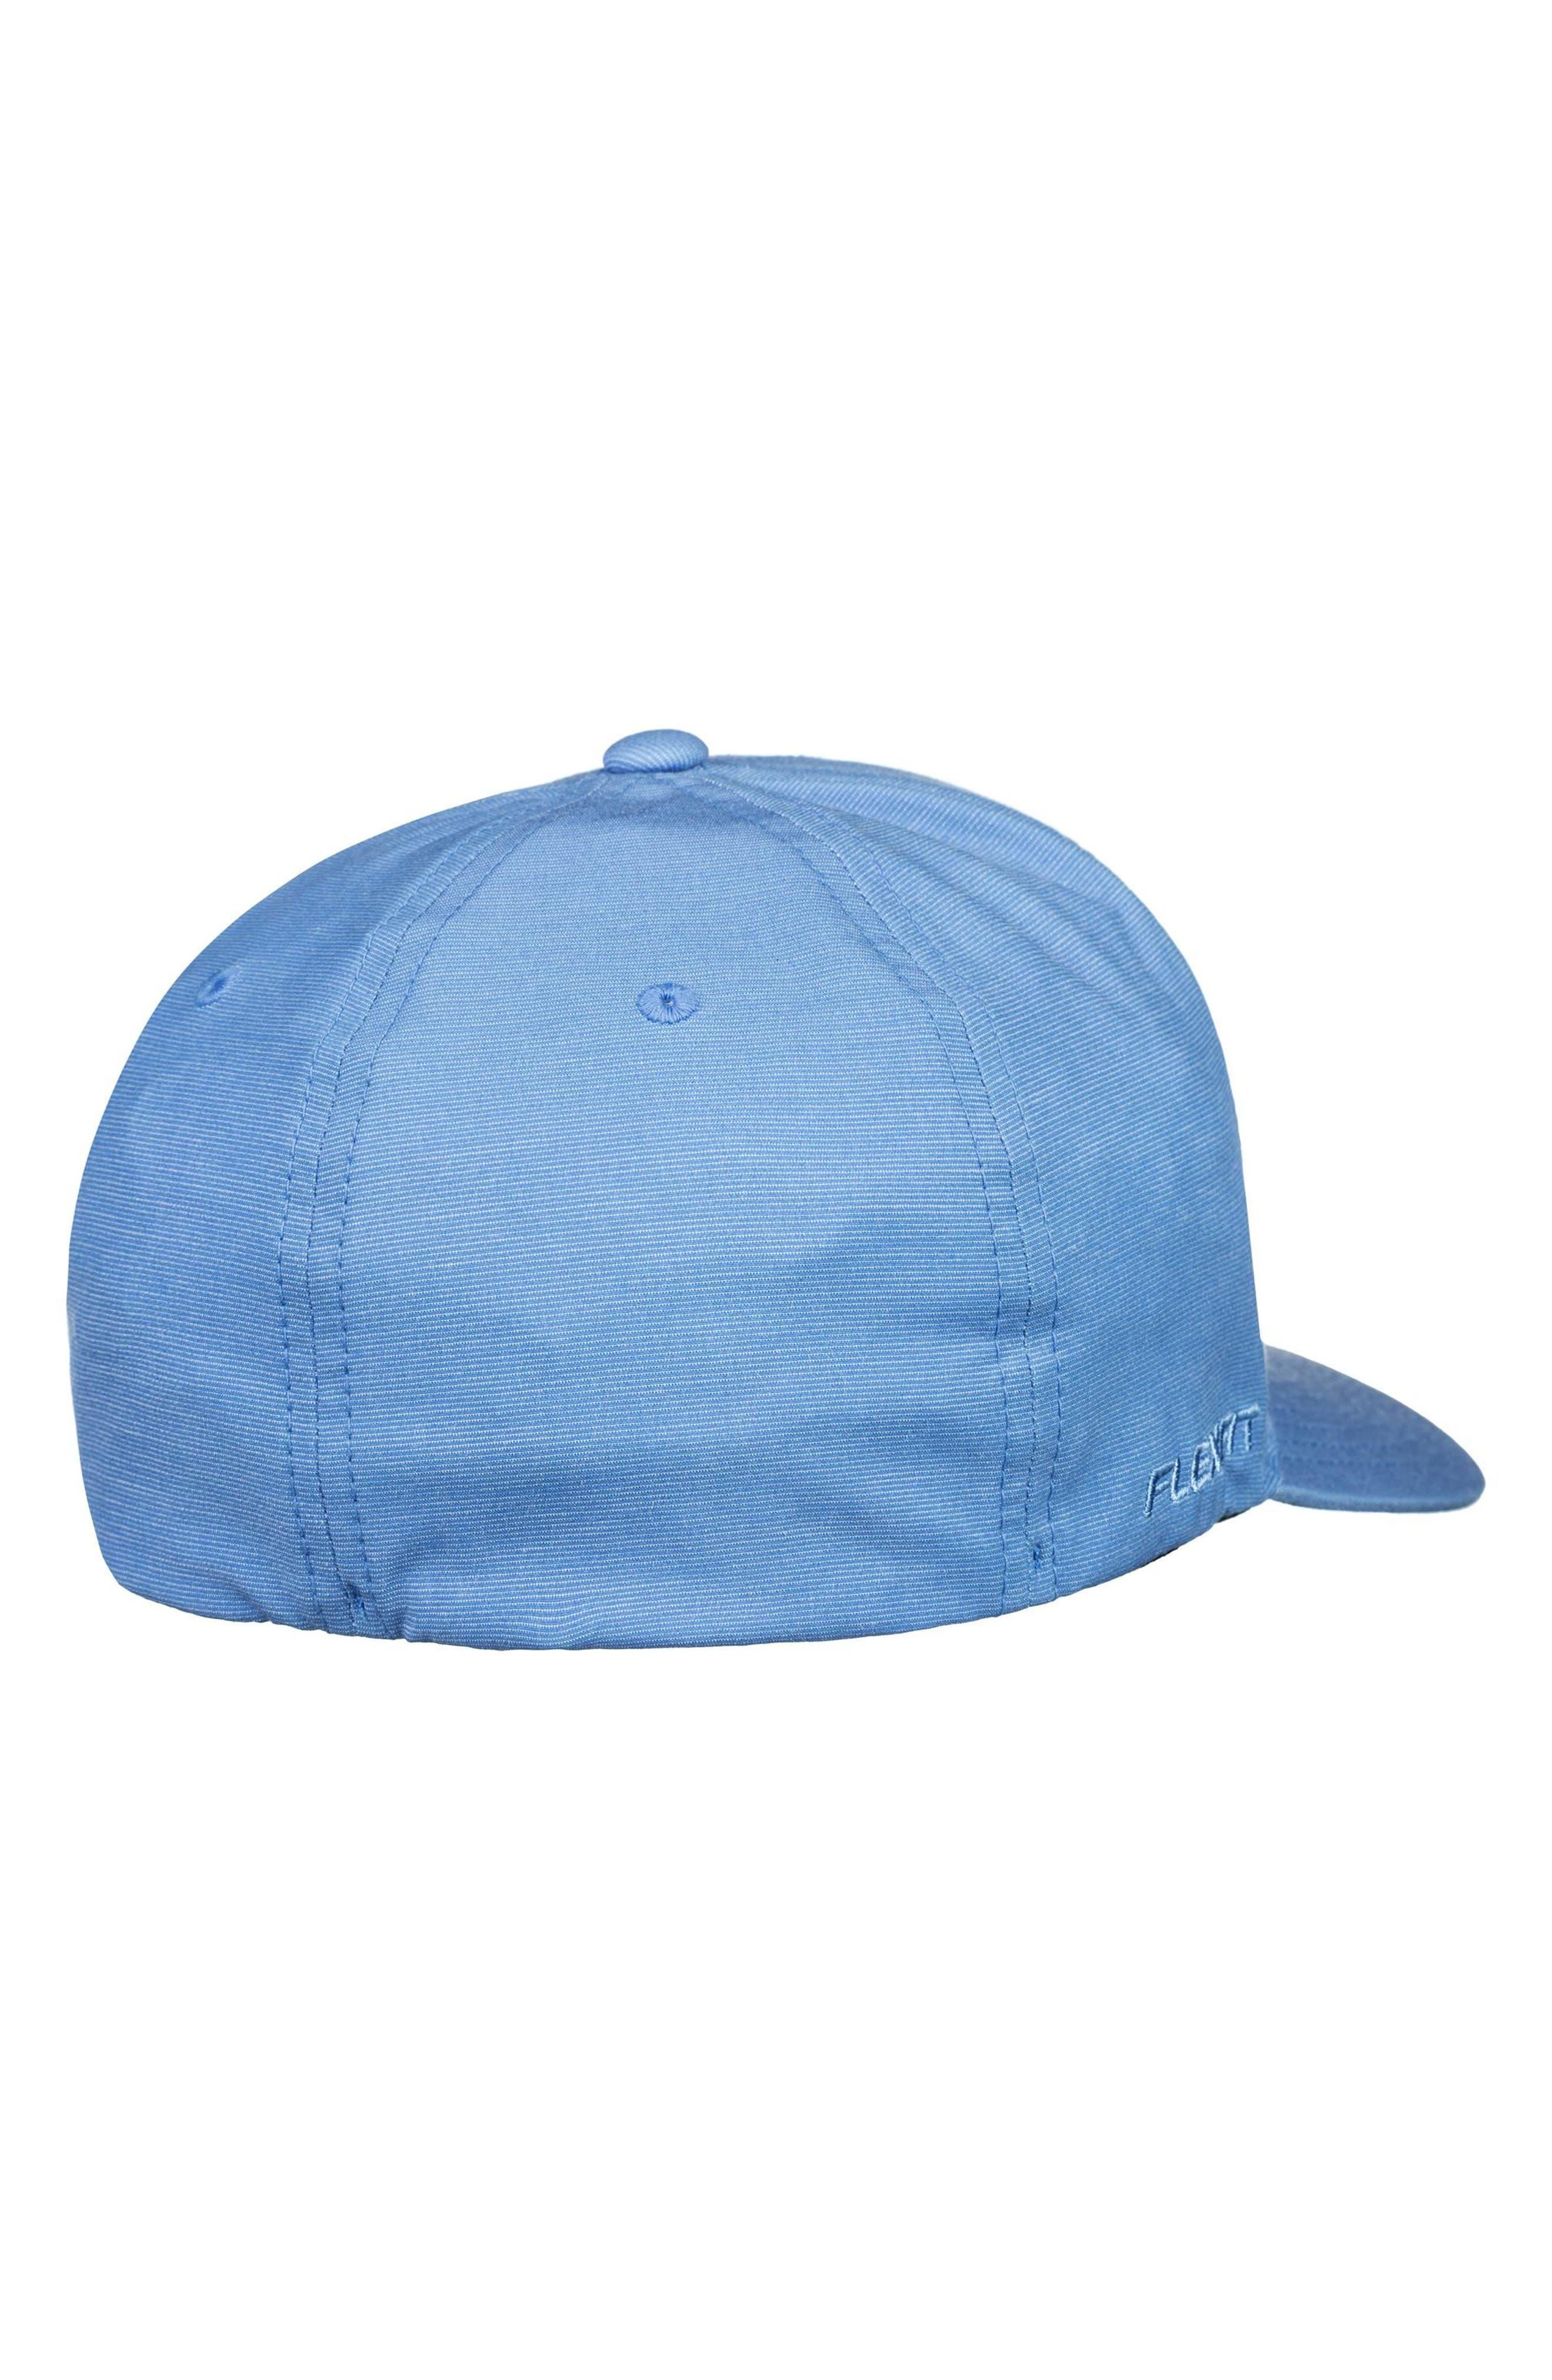 Texturizer Flexfit Ball Cap,                             Alternate thumbnail 2, color,                             Silver Lake Blue